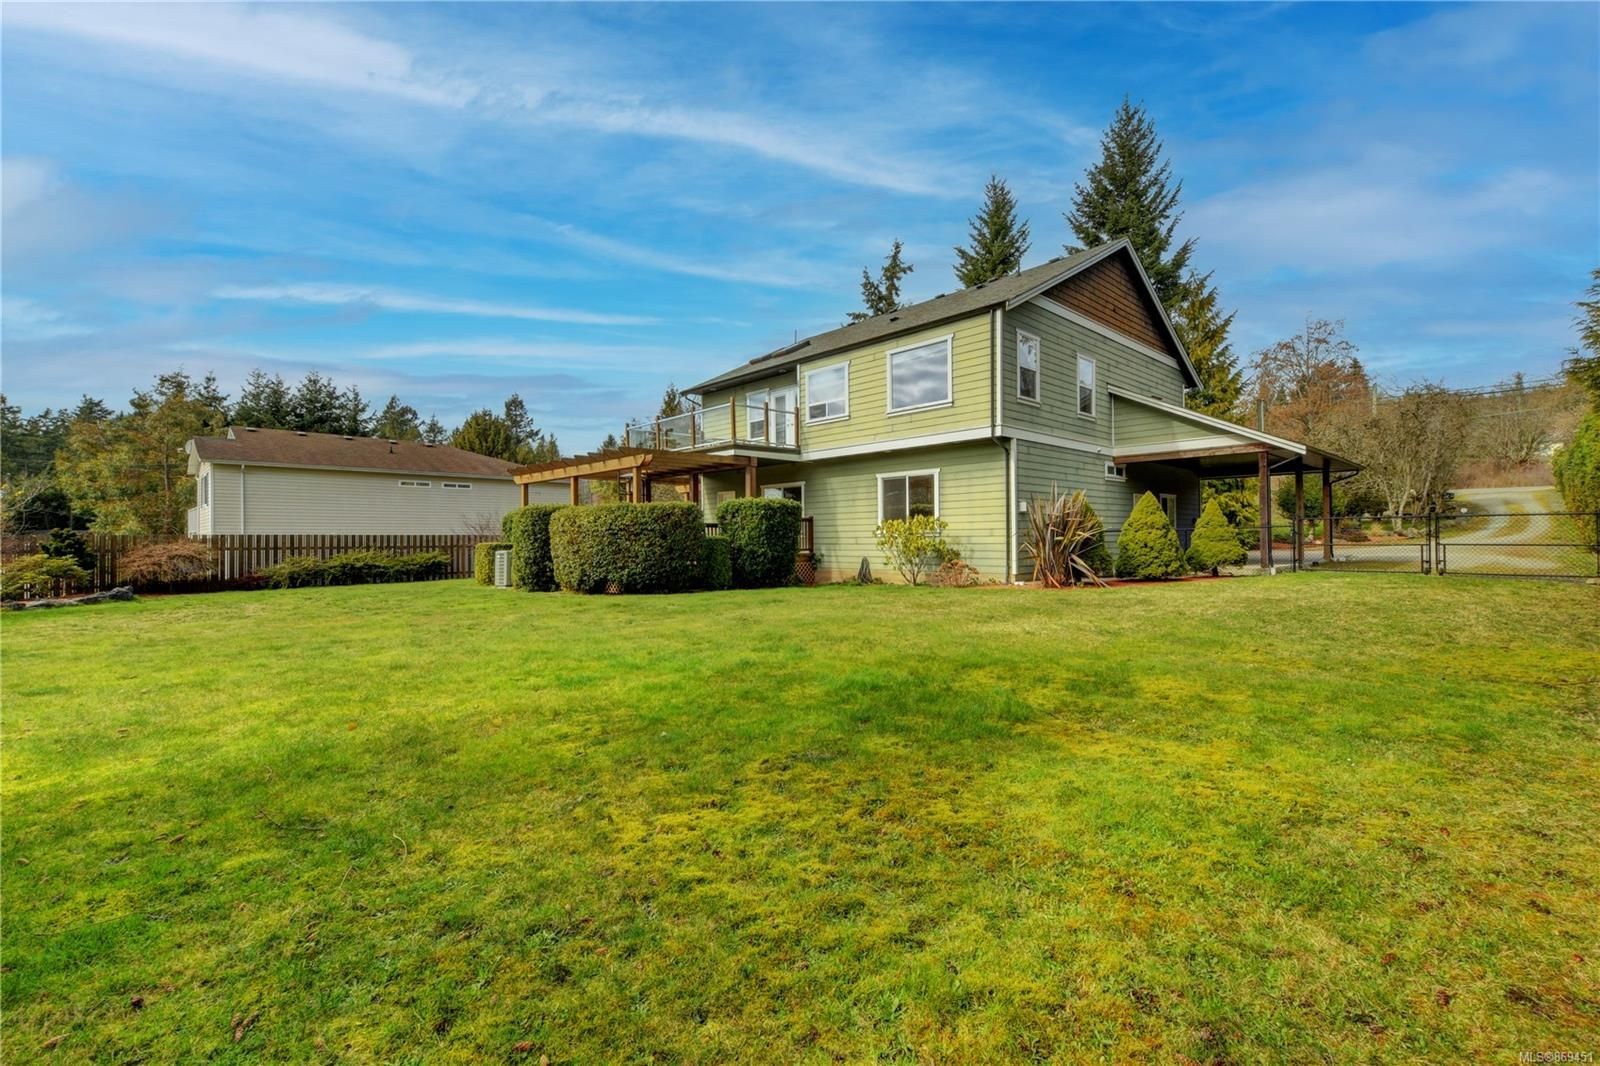 Main Photo: 5709 Sooke Rd in : Sk Saseenos House for sale (Sooke)  : MLS®# 869451